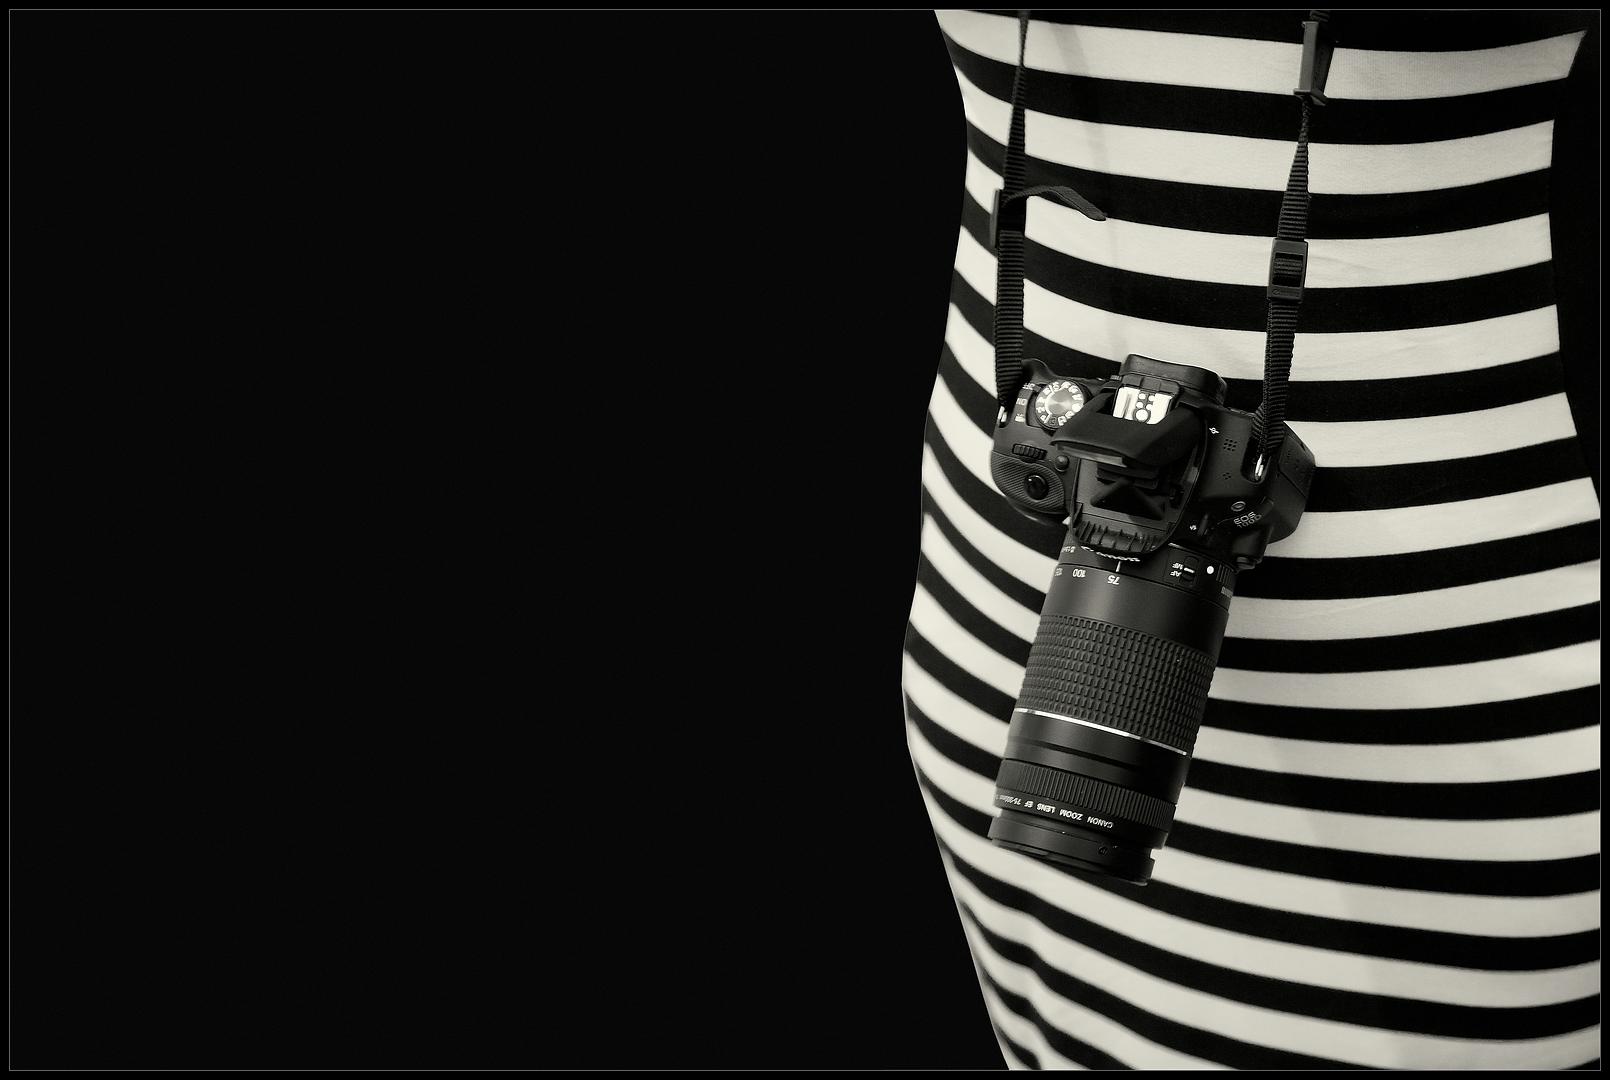 BW Photographer-Michael Feistel